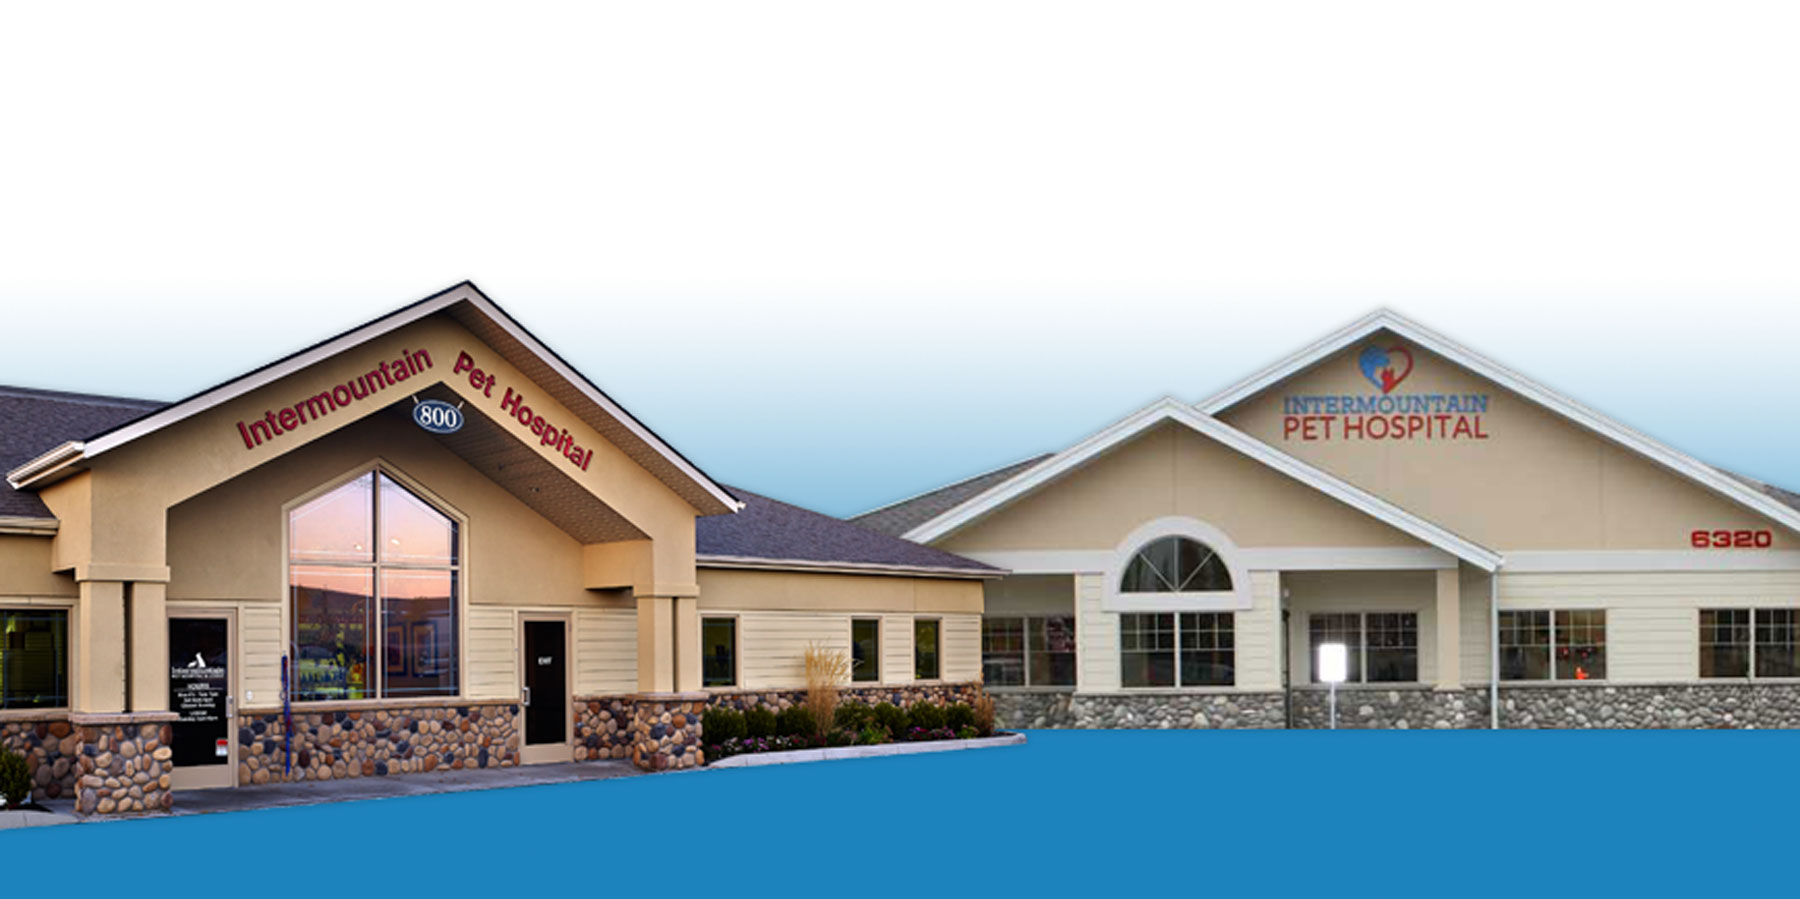 Now 2 Intermountain Pet Hospital Locations